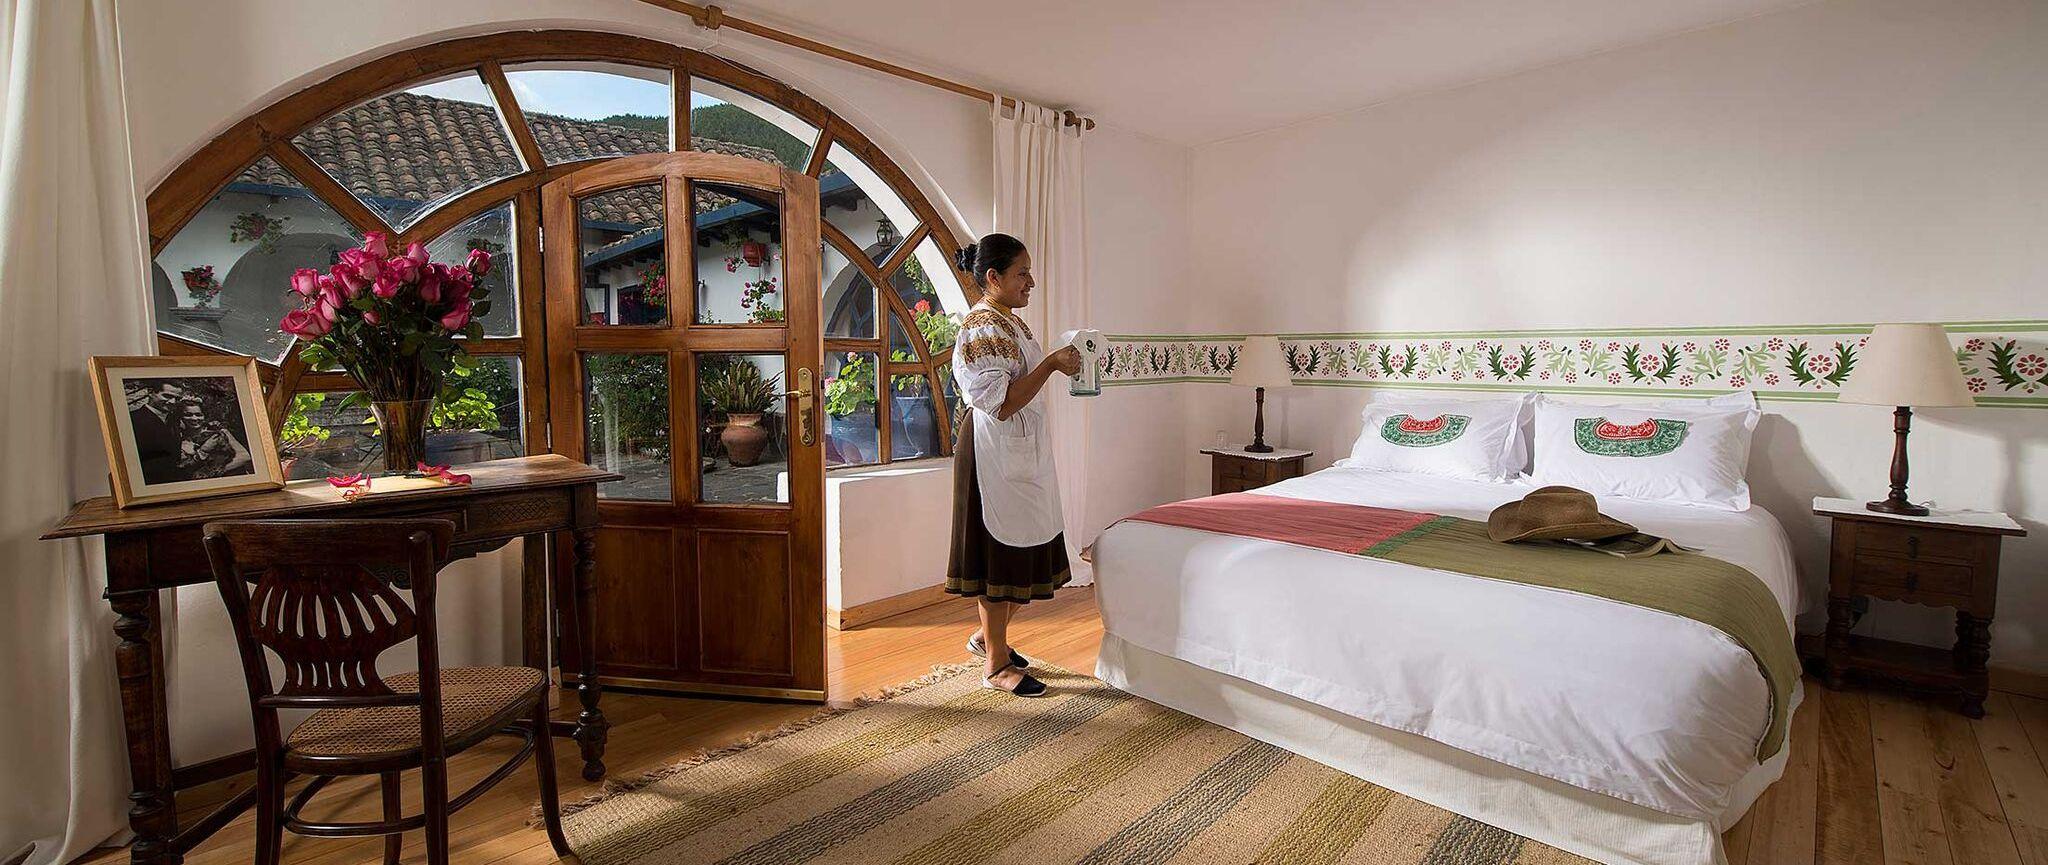 deluxe-room-hacienda-zuleta-otavalo